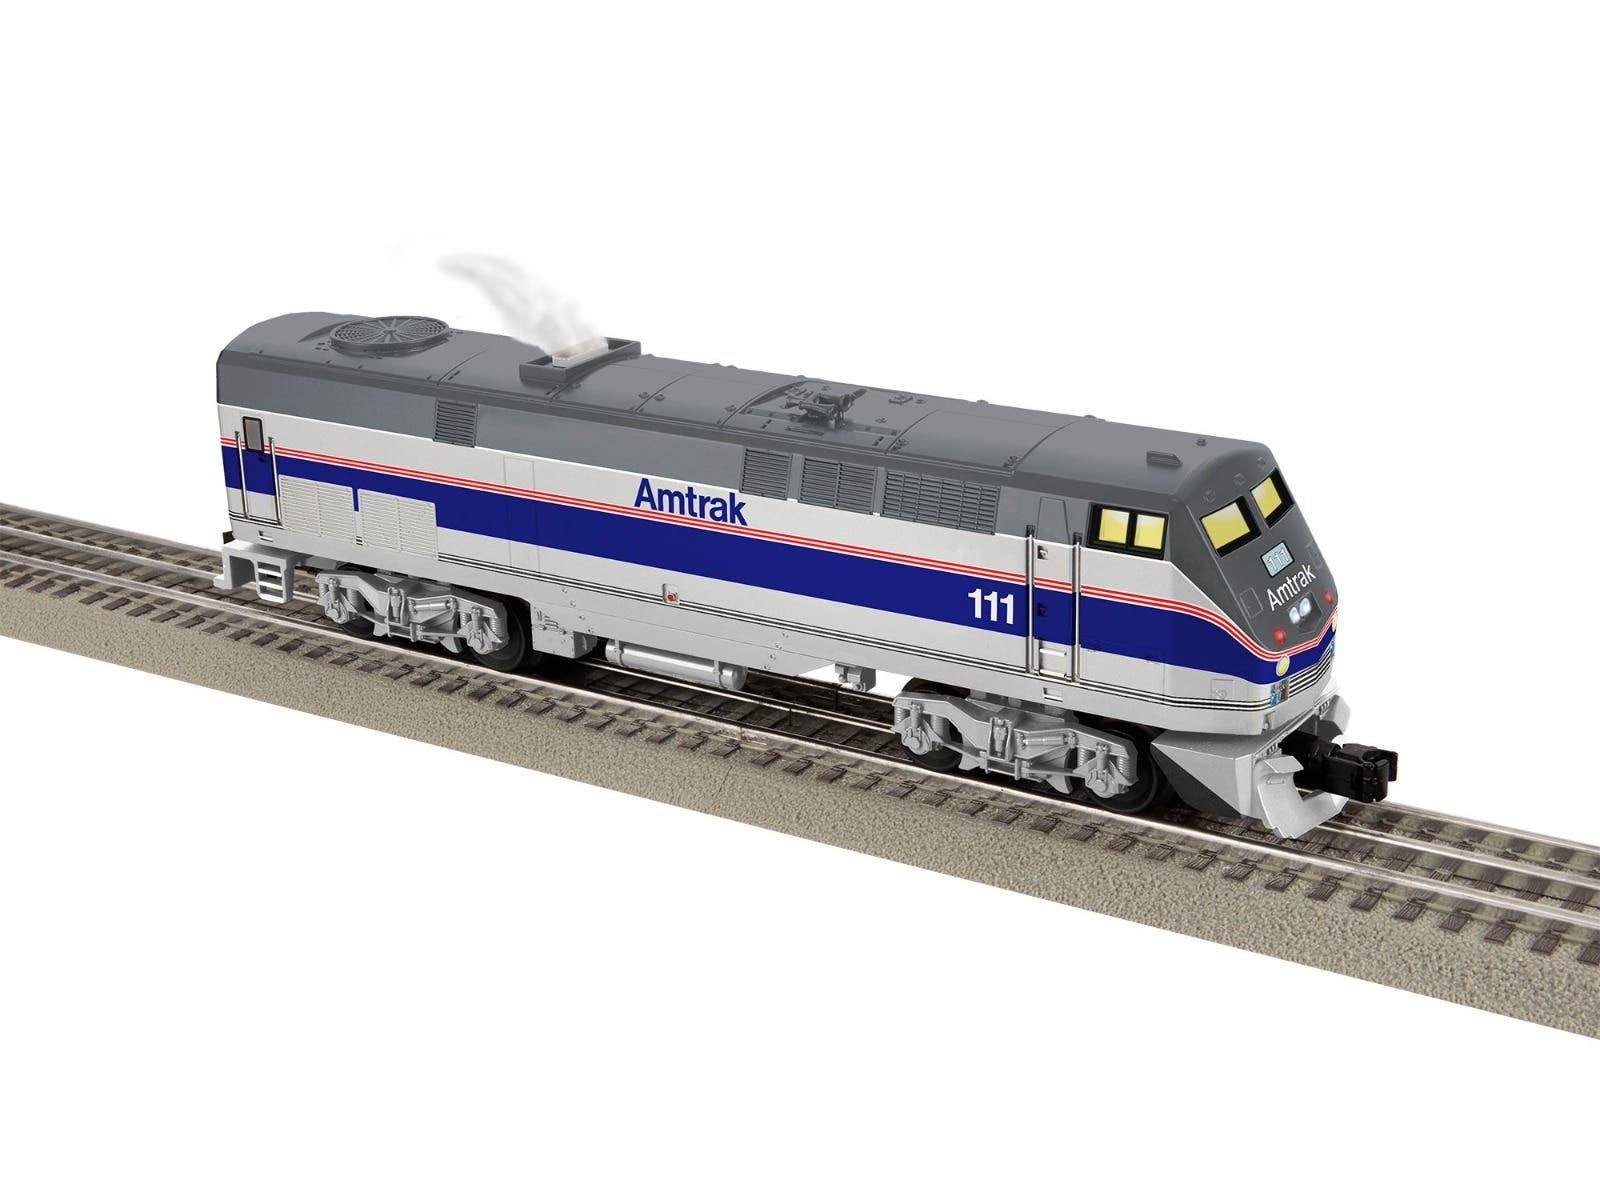 Lionel Trains 2234060 Amtrak LionChief Plus 2.0 Genesis #111